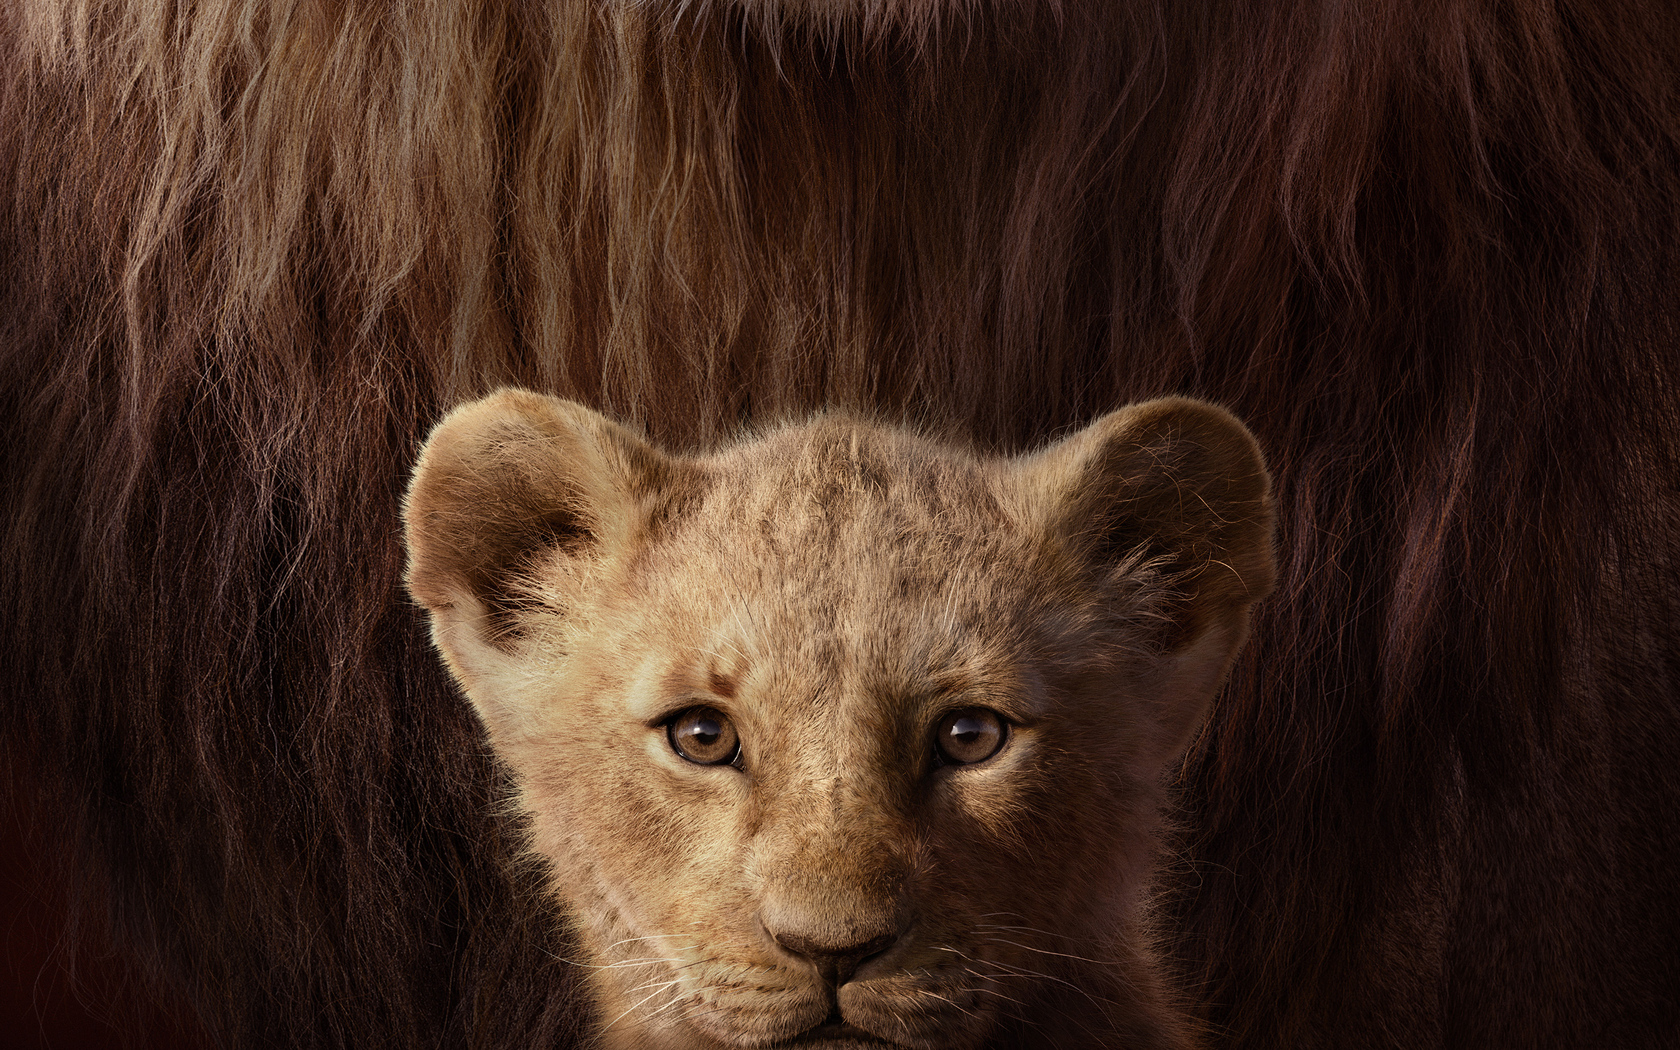 the-lion-king-key-art-4k-lw.jpg